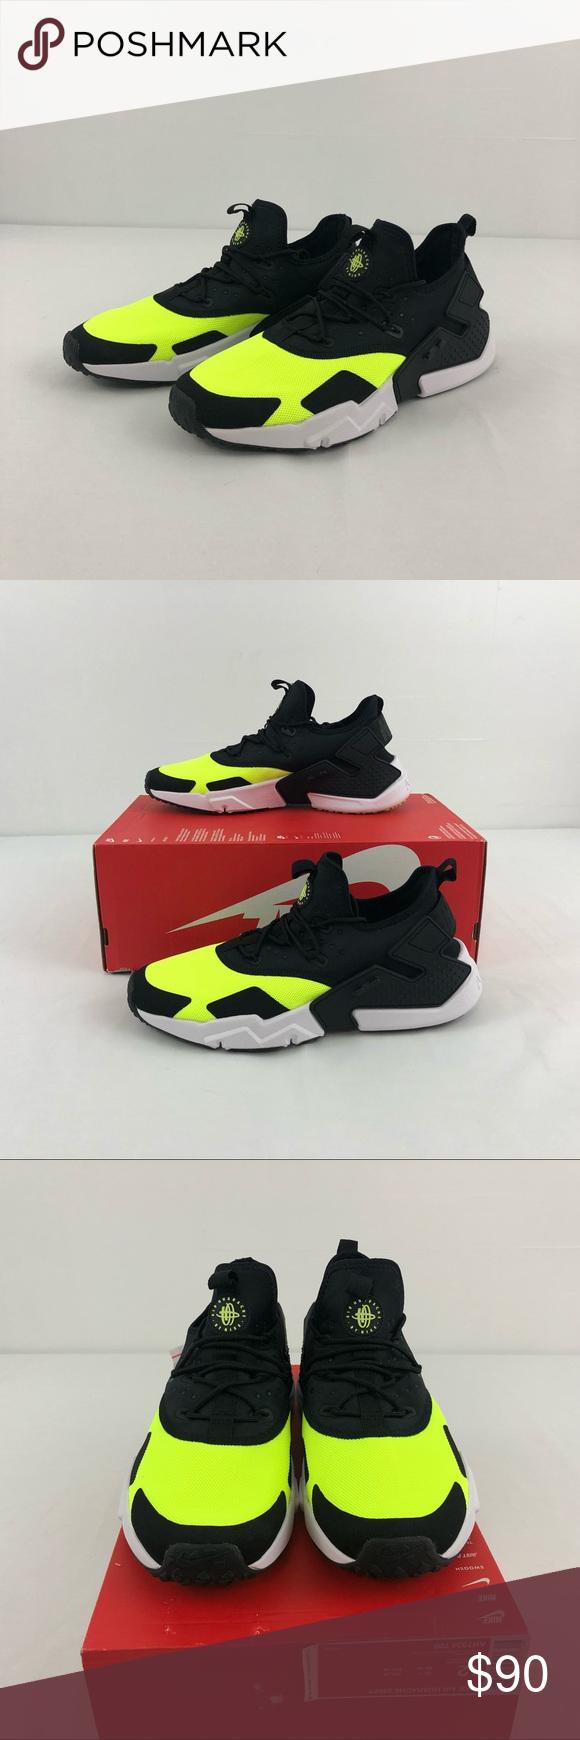 best loved 23c0e 7a3cb Nike Air Huarache Drift Nike Air Huarache Drift Men s Size 12 Style  AH7334  700 Color  Volt Black-White New in box (no lid) Please feel free to make an  ...